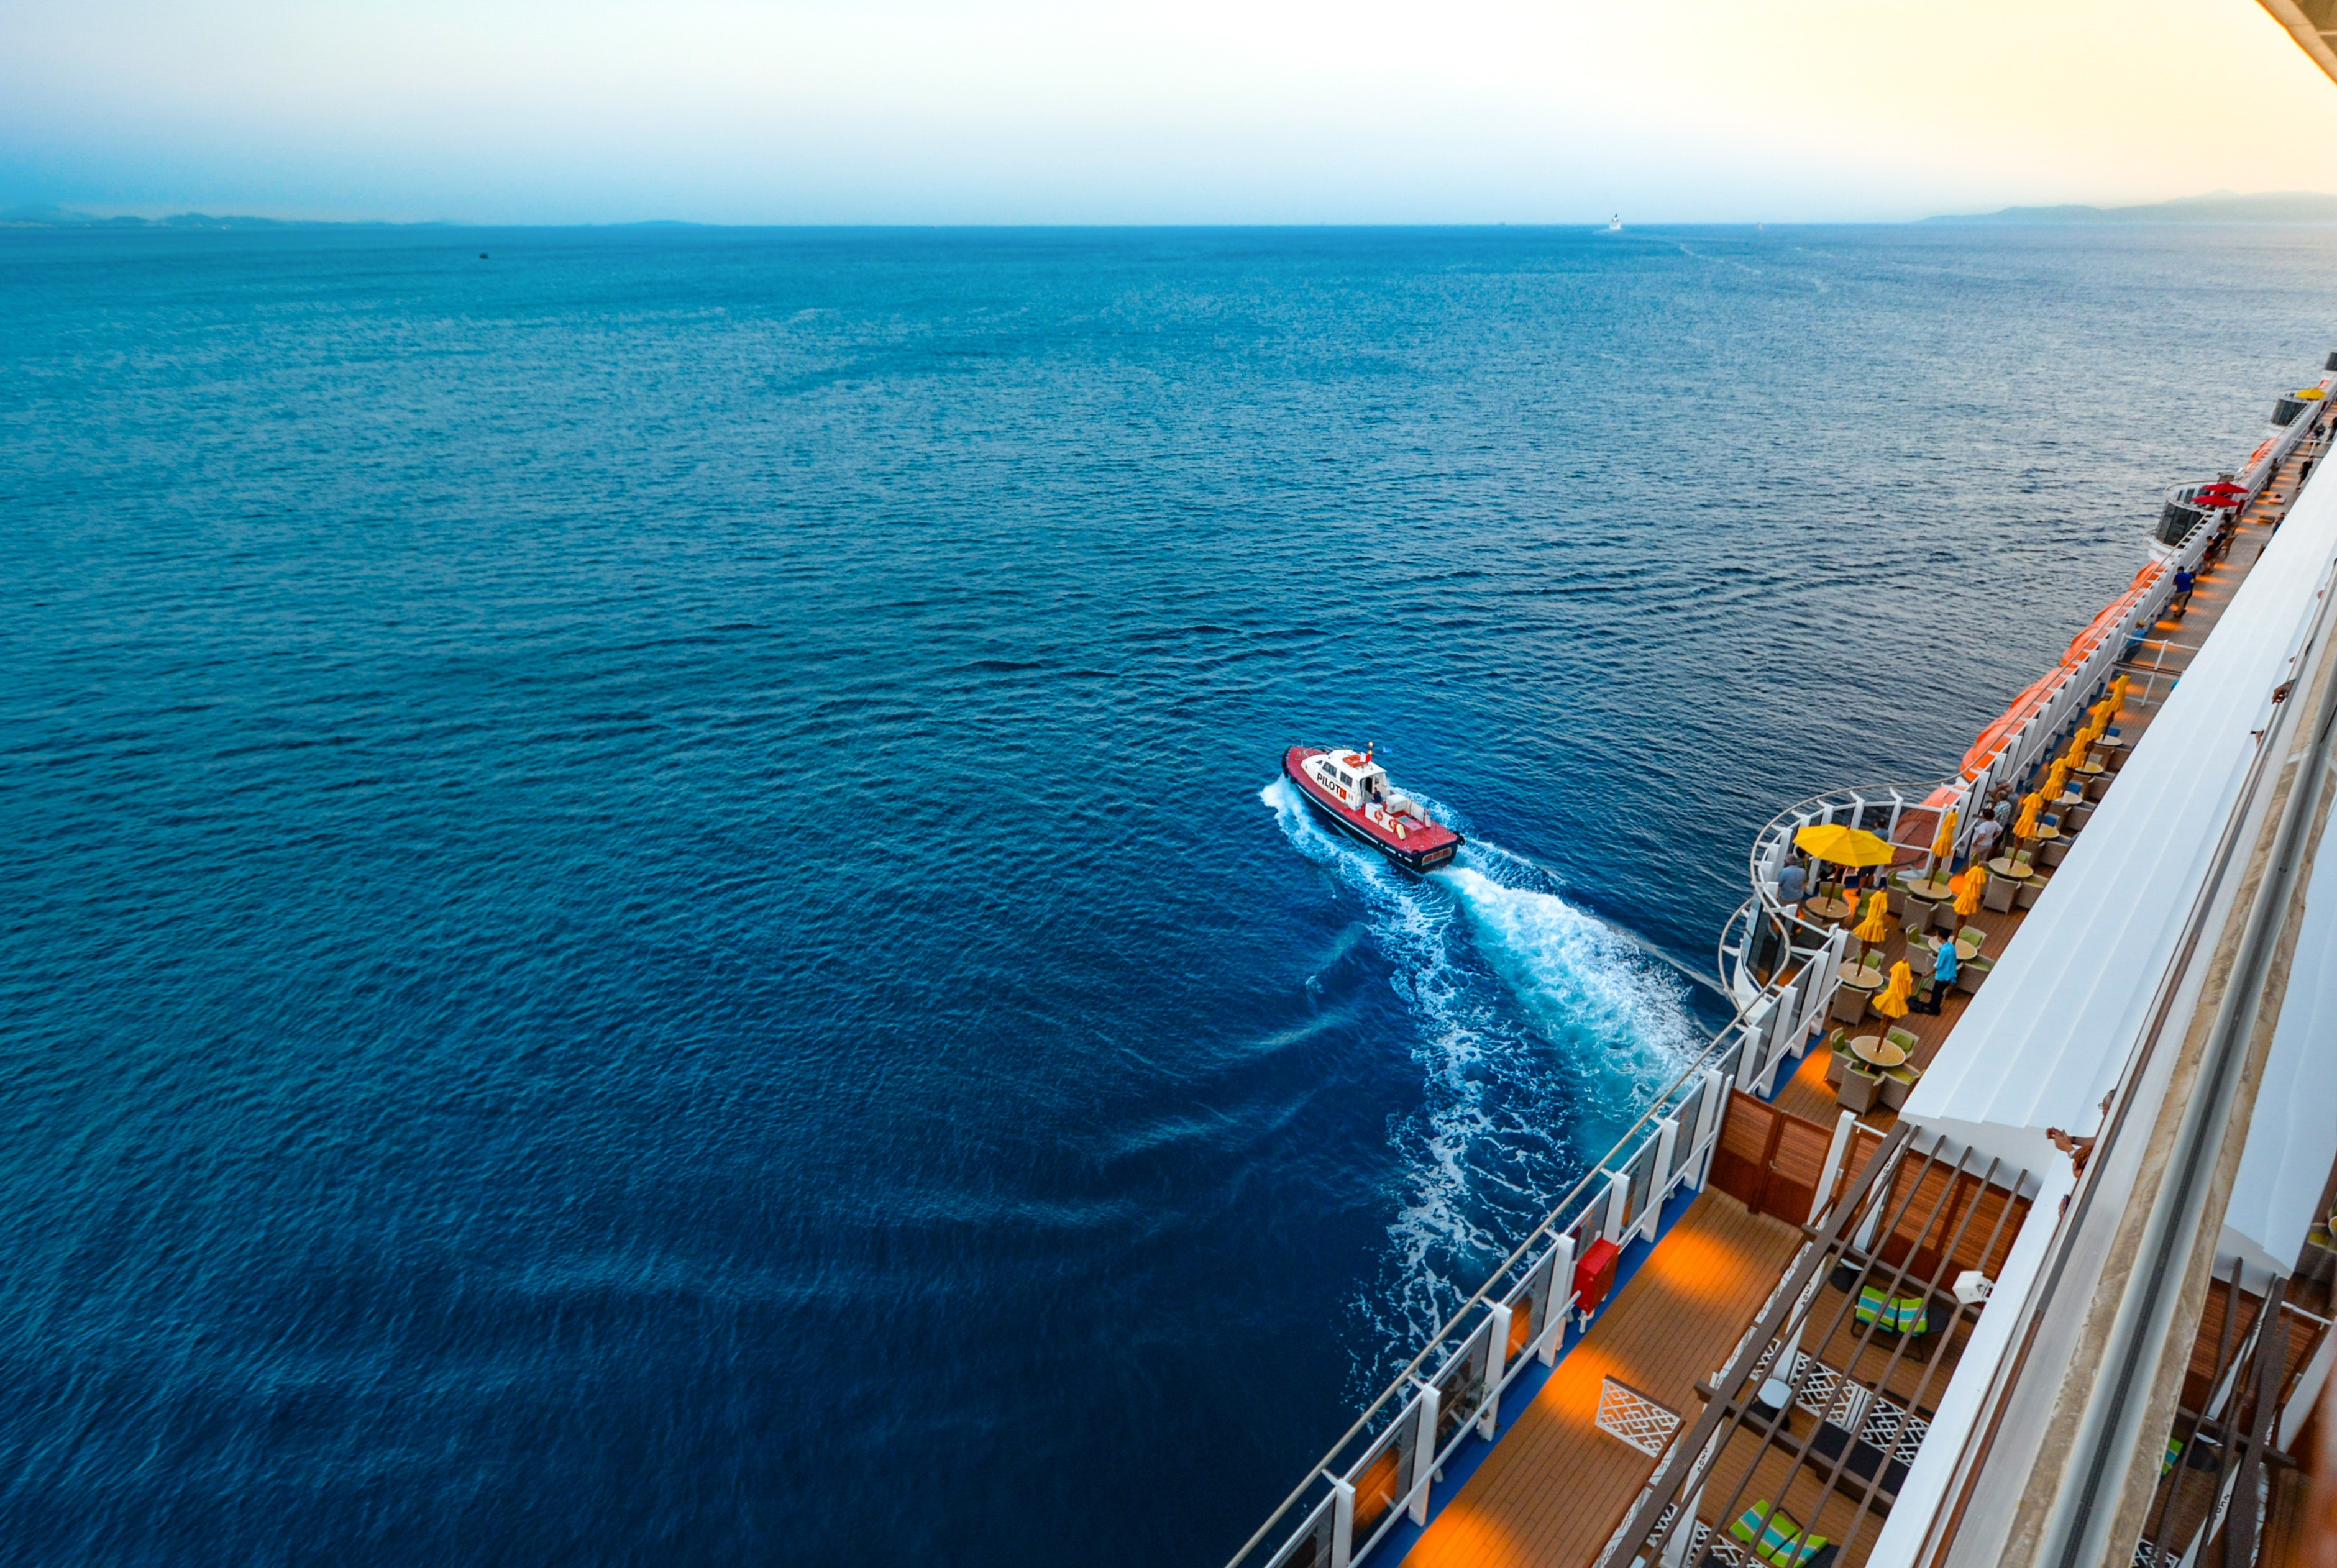 High angle view of people sailing on sea photo